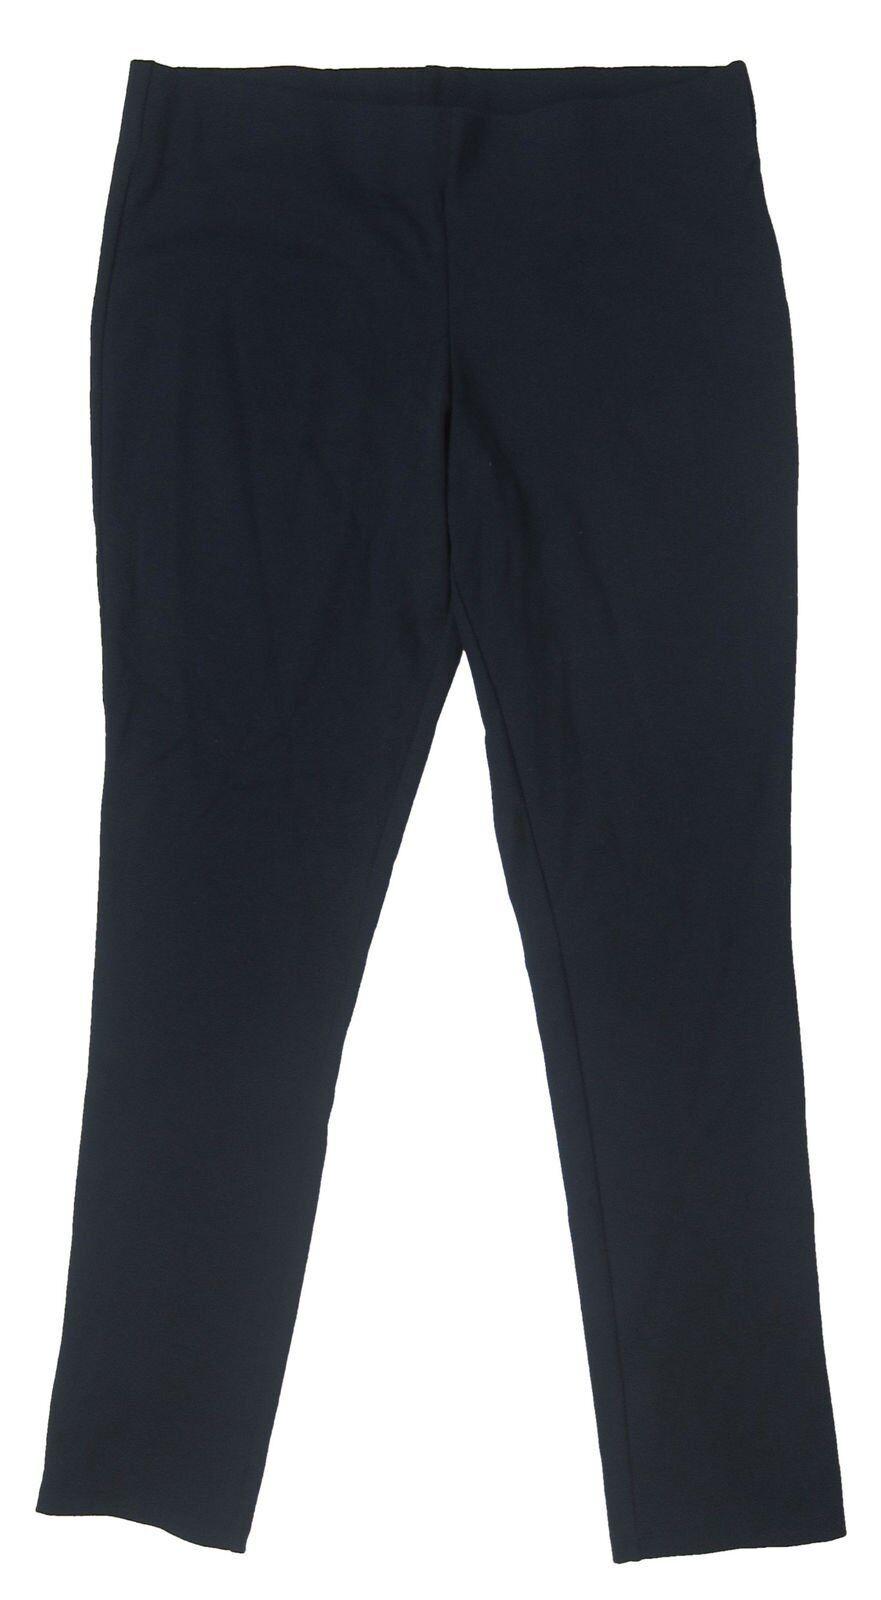 Lauren Ralph Lauren - NWT Women's Navy Stretch Straight Pant - Petite Medium